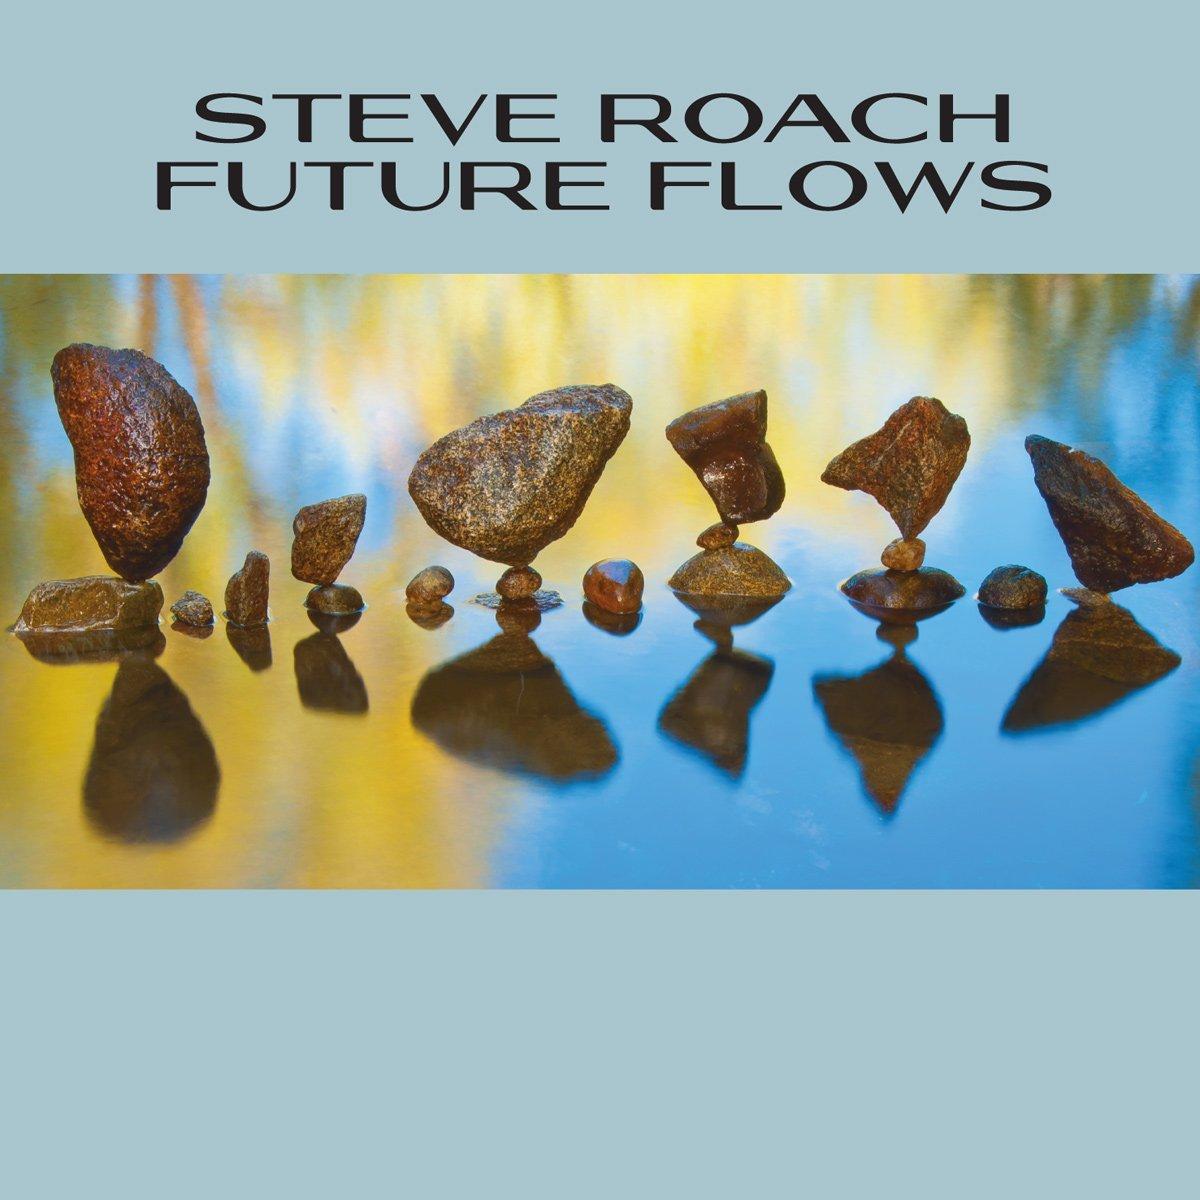 Steve Roach — Future Flows